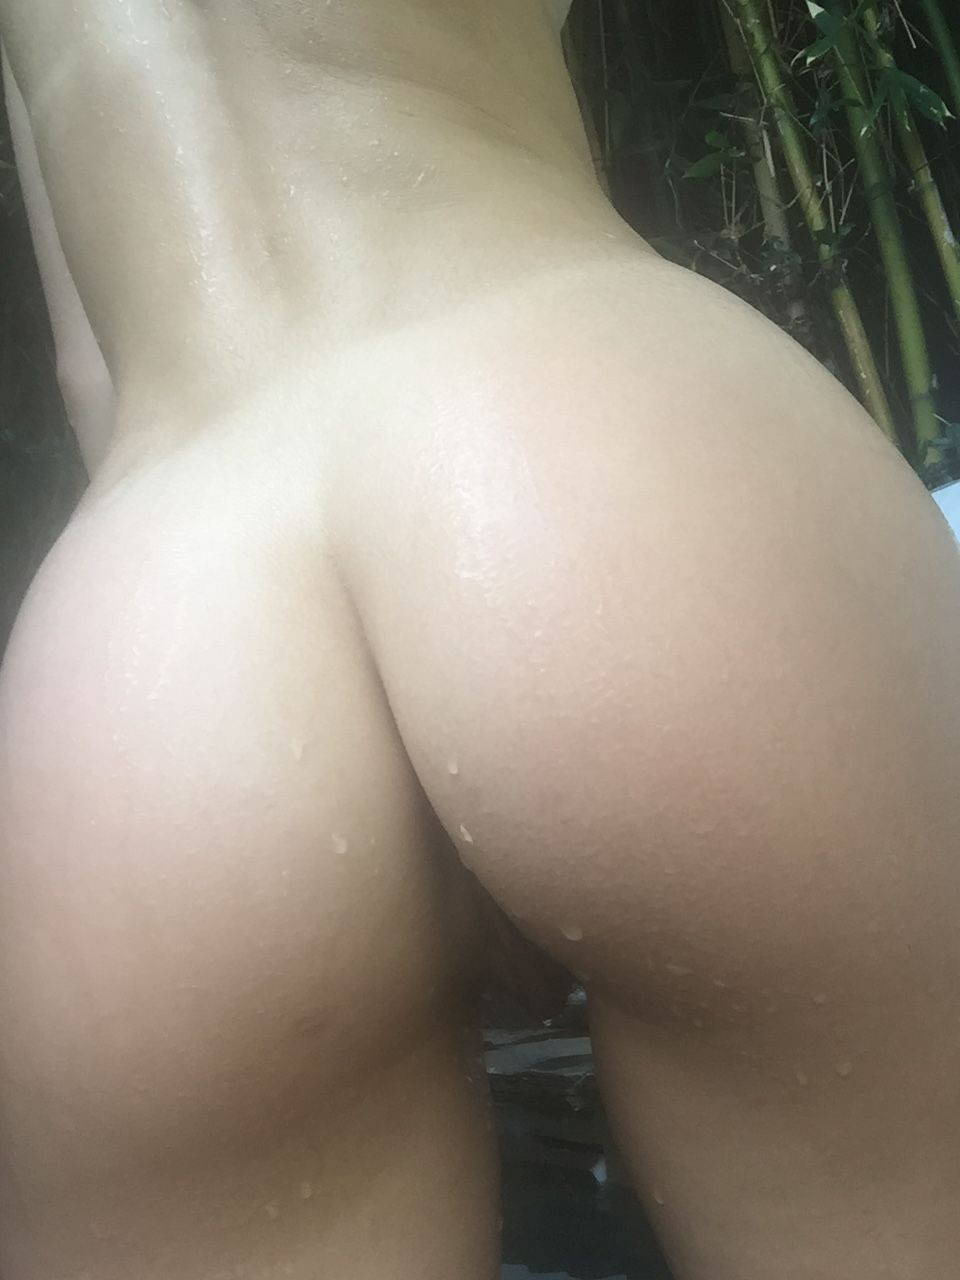 Suki Waterhouse nude photos leaked The Fappening